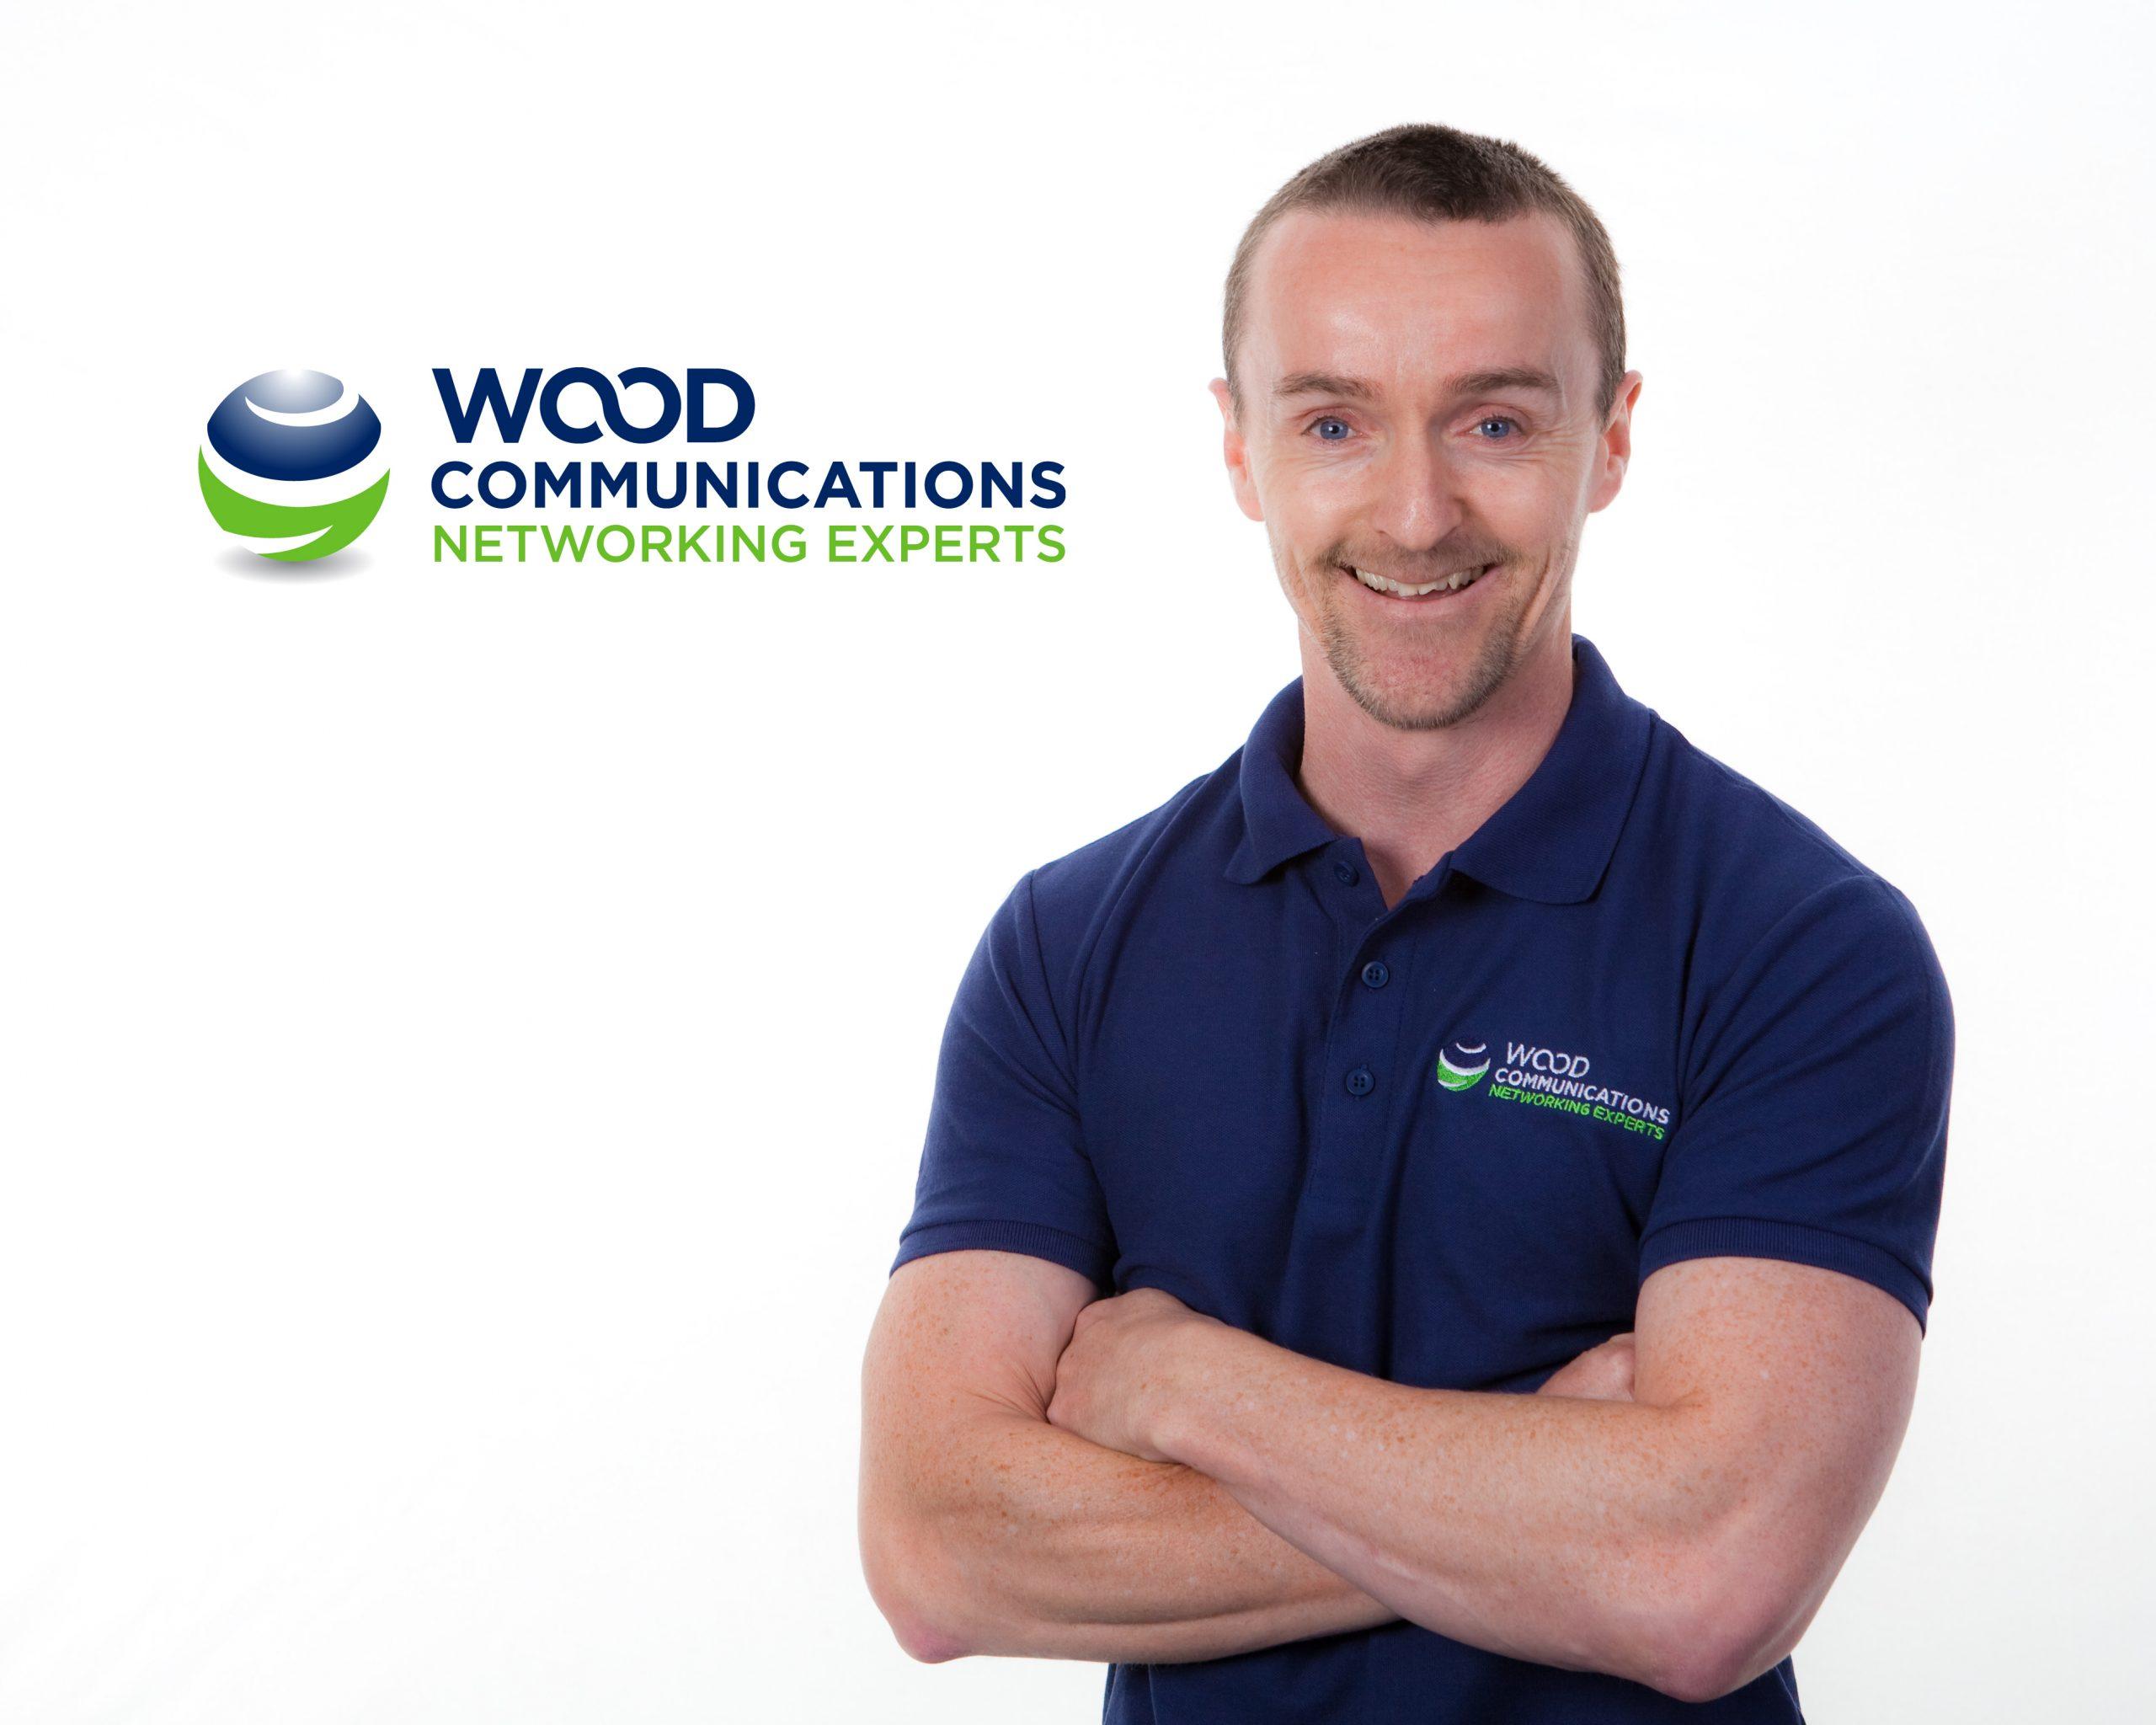 1. Eddie Needham - wood communications networking expert